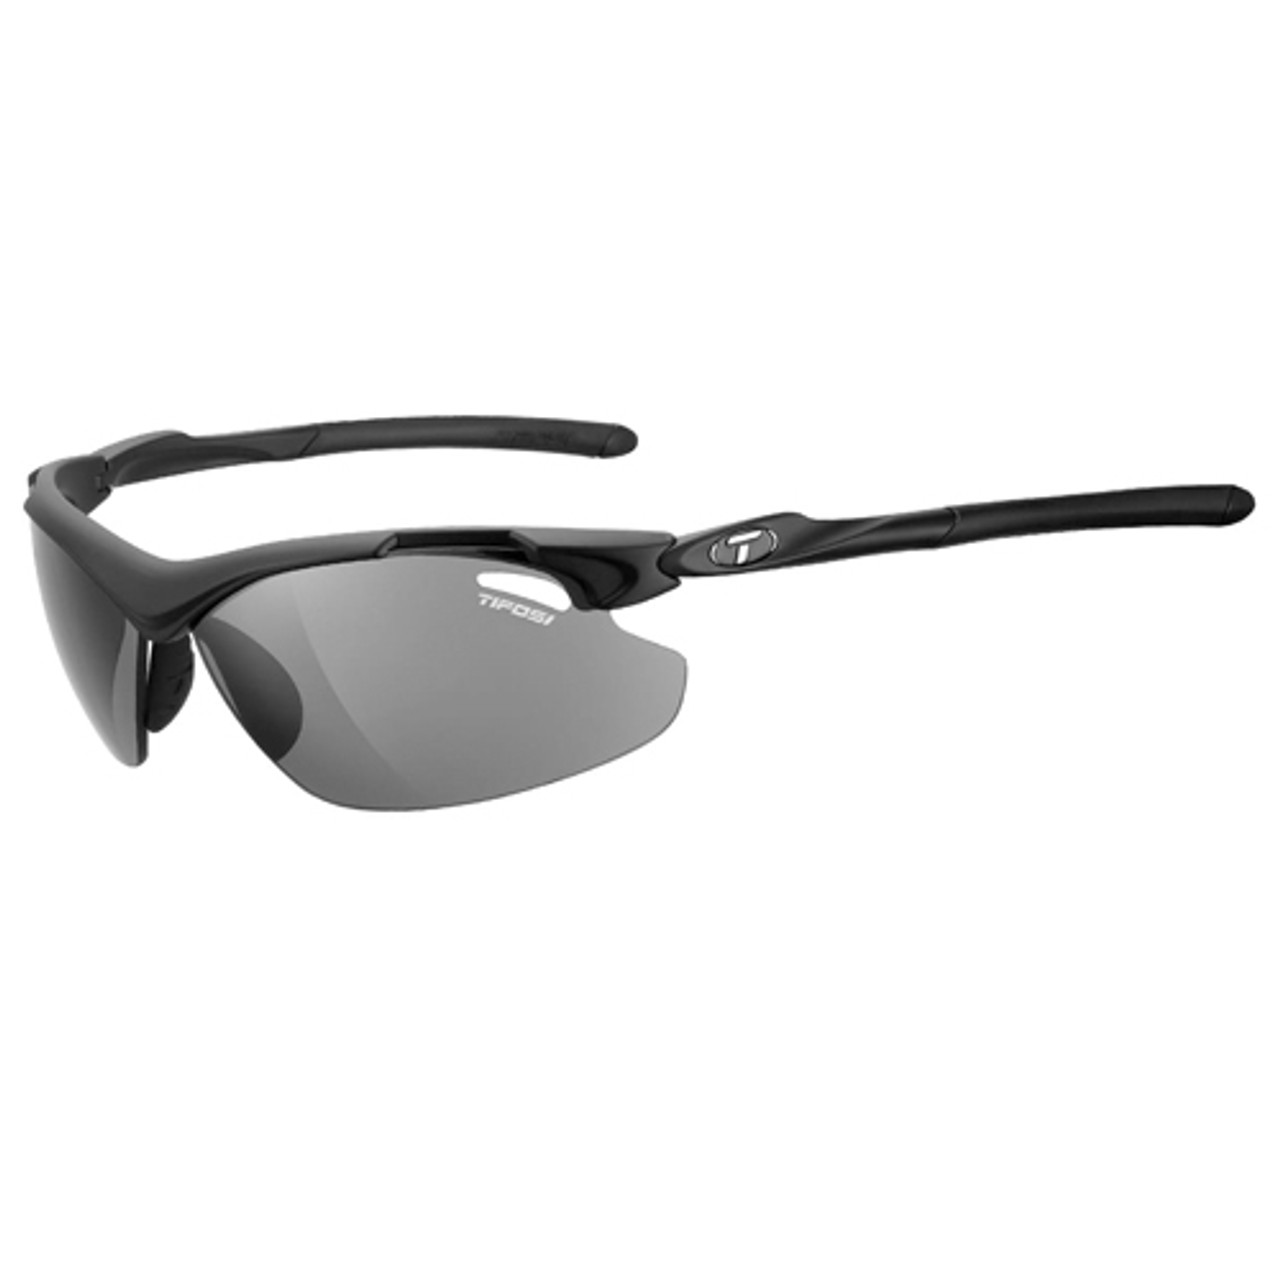 Tifosi Optics Tyrant 2.0 Sunglasses